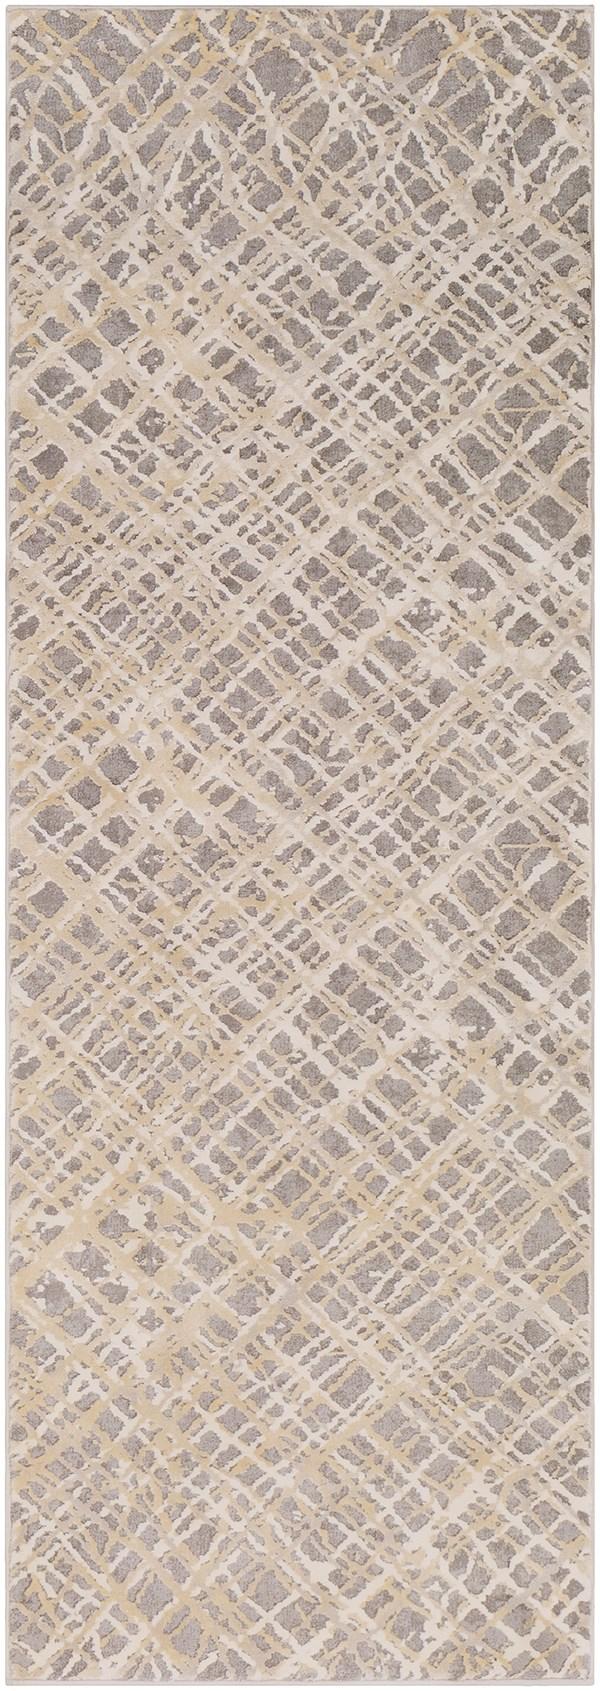 Taupe, Charcoal, Khaki, Cream, Grey Contemporary / Modern Area Rug